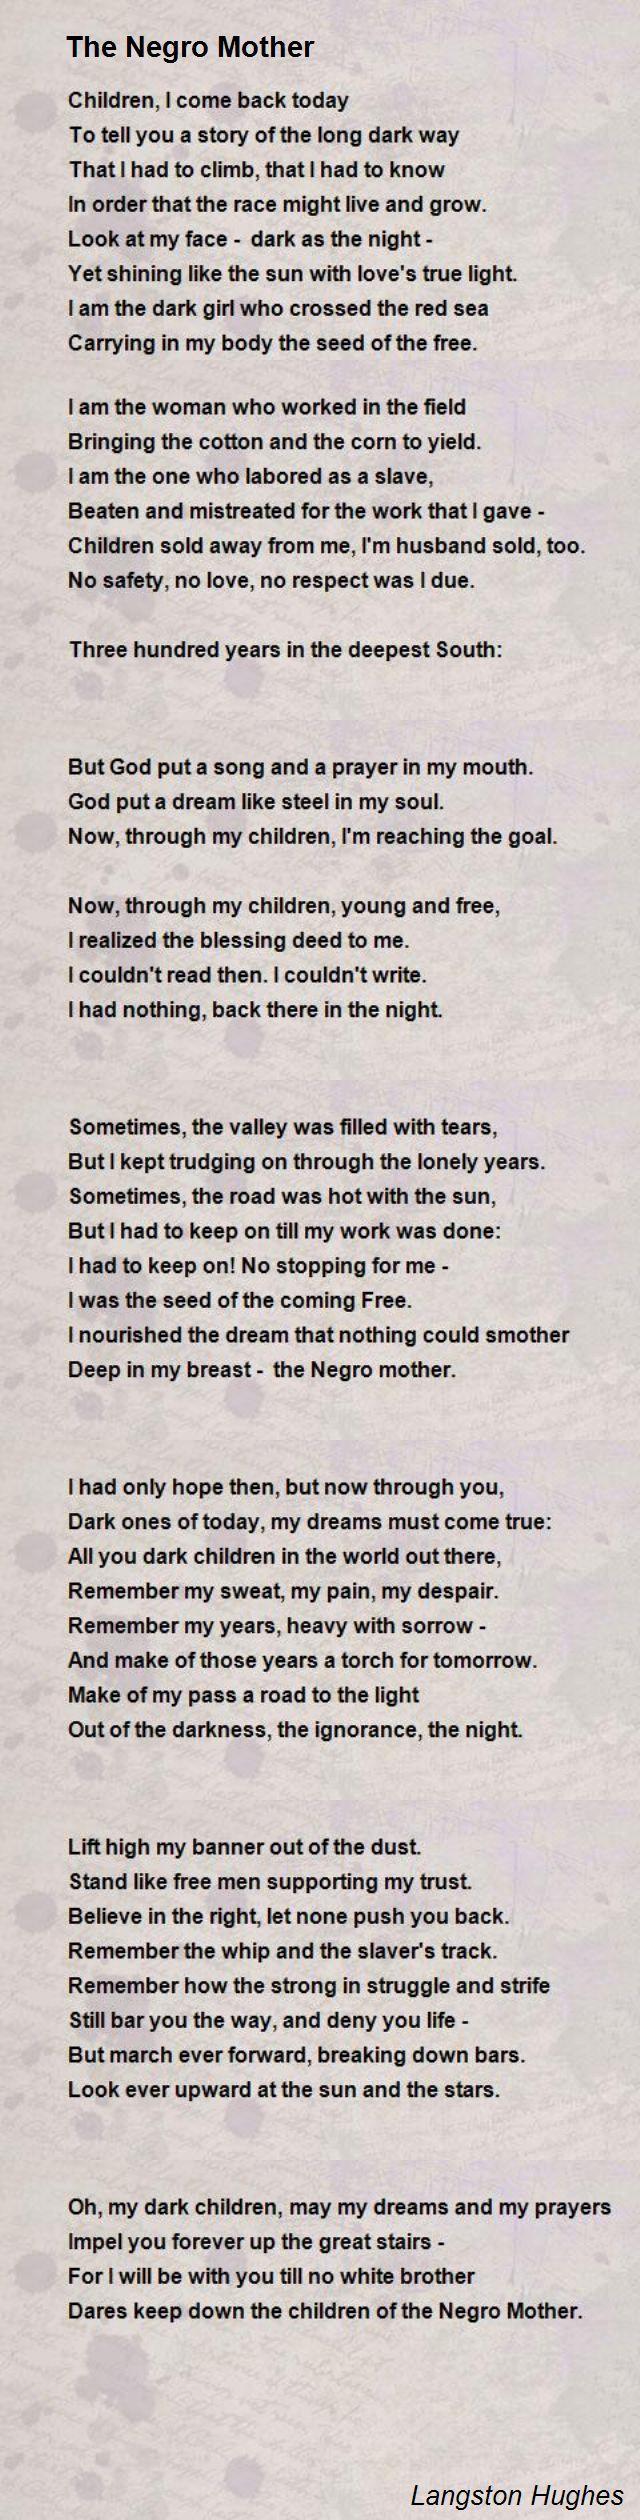 Essay On Langston Hughes Literature Berry By Langston Hughes 17 Best